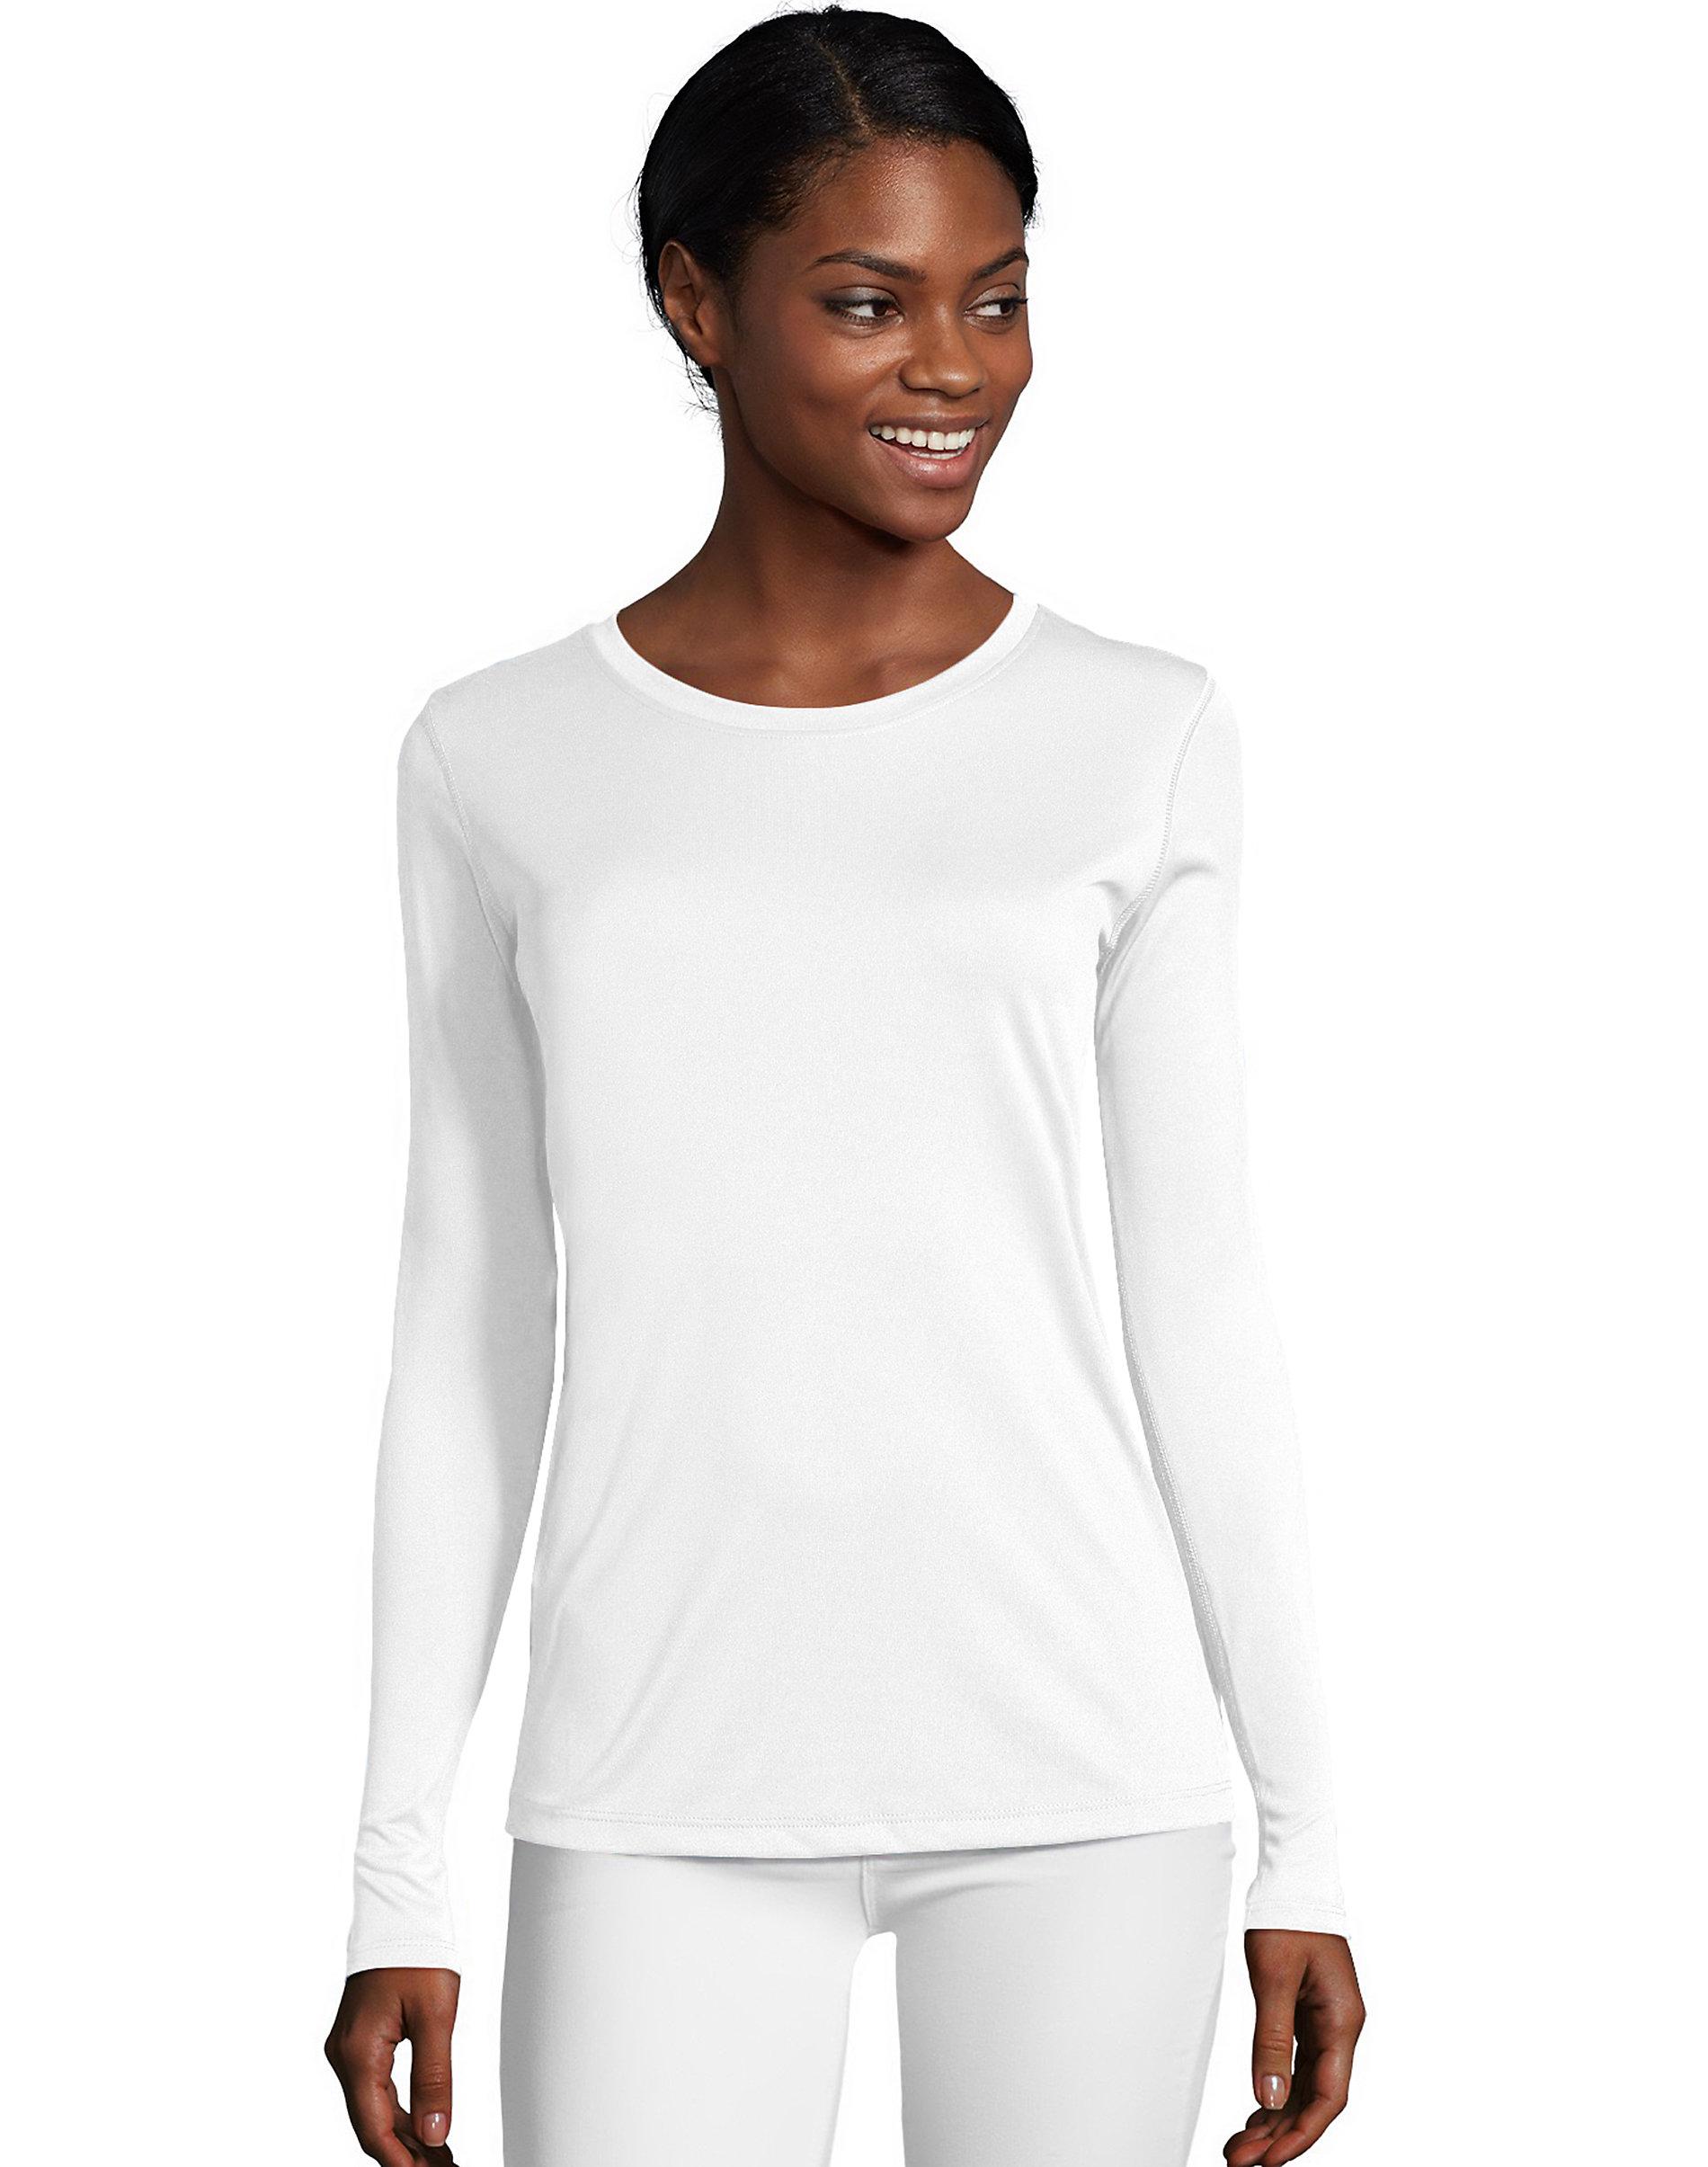 Hanes-Long-Sleeve-T-Shirt-Sport-Cool-DRI-Womens-Performance-Tee-Activewear-S-2XL thumbnail 8